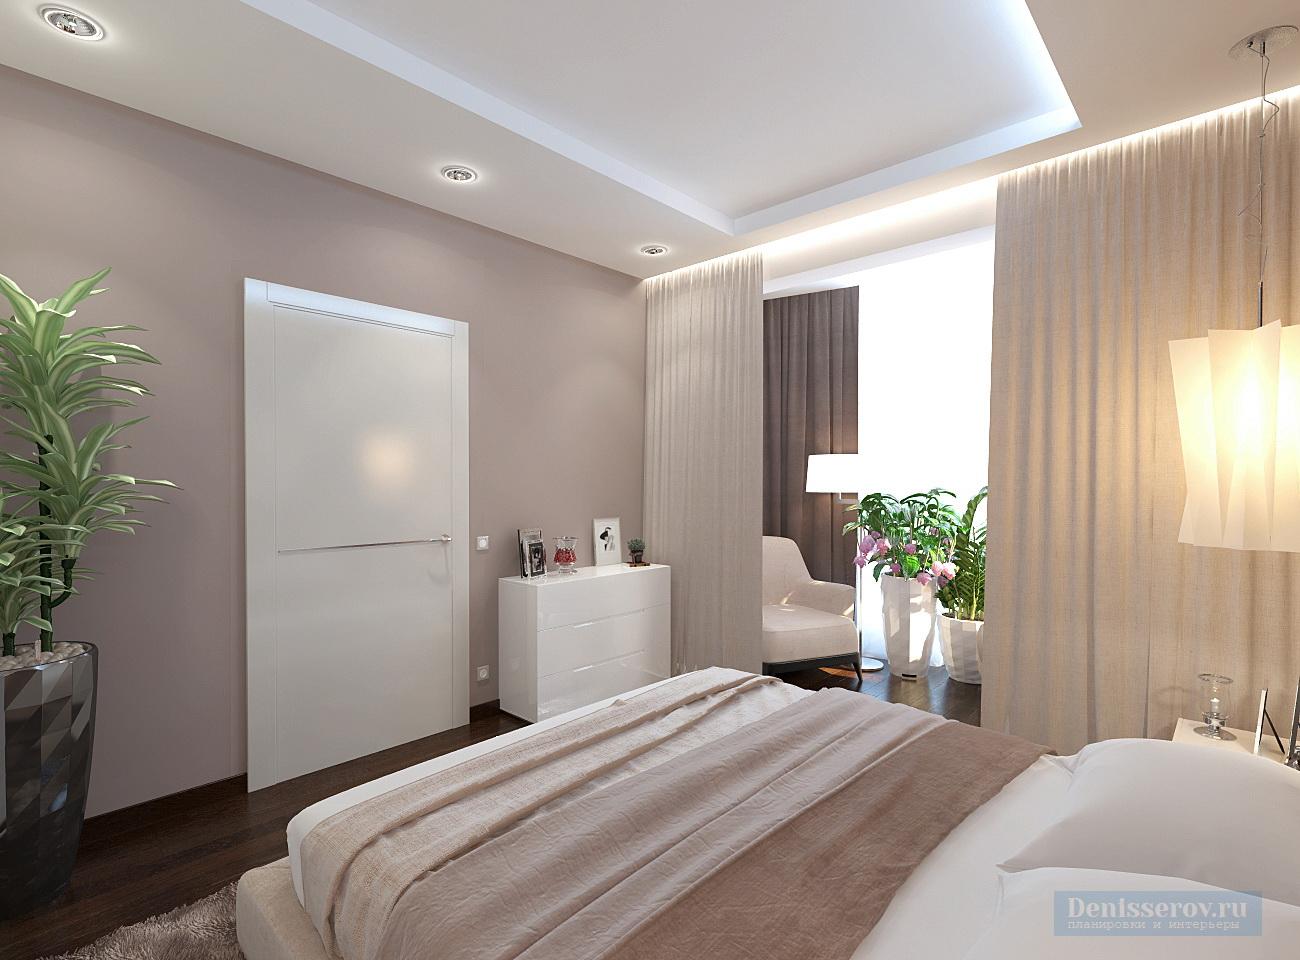 Proekt-dizajn-spalni-17-kv-m-v-stile-minimalizm-1